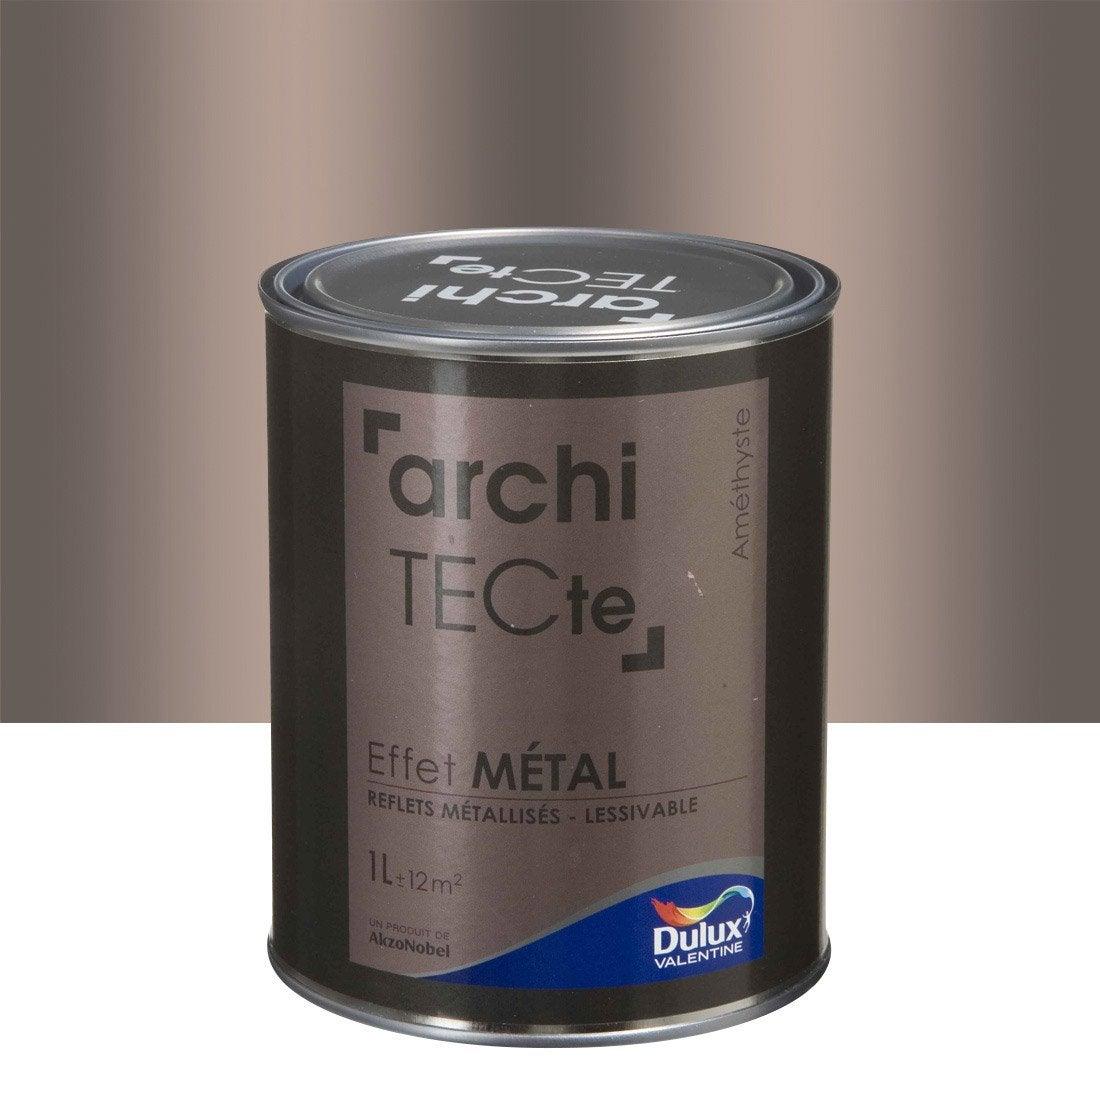 Peinture d corative effet m tal dulux valentine am thyste - Leroy merlin peinture effet metal ...